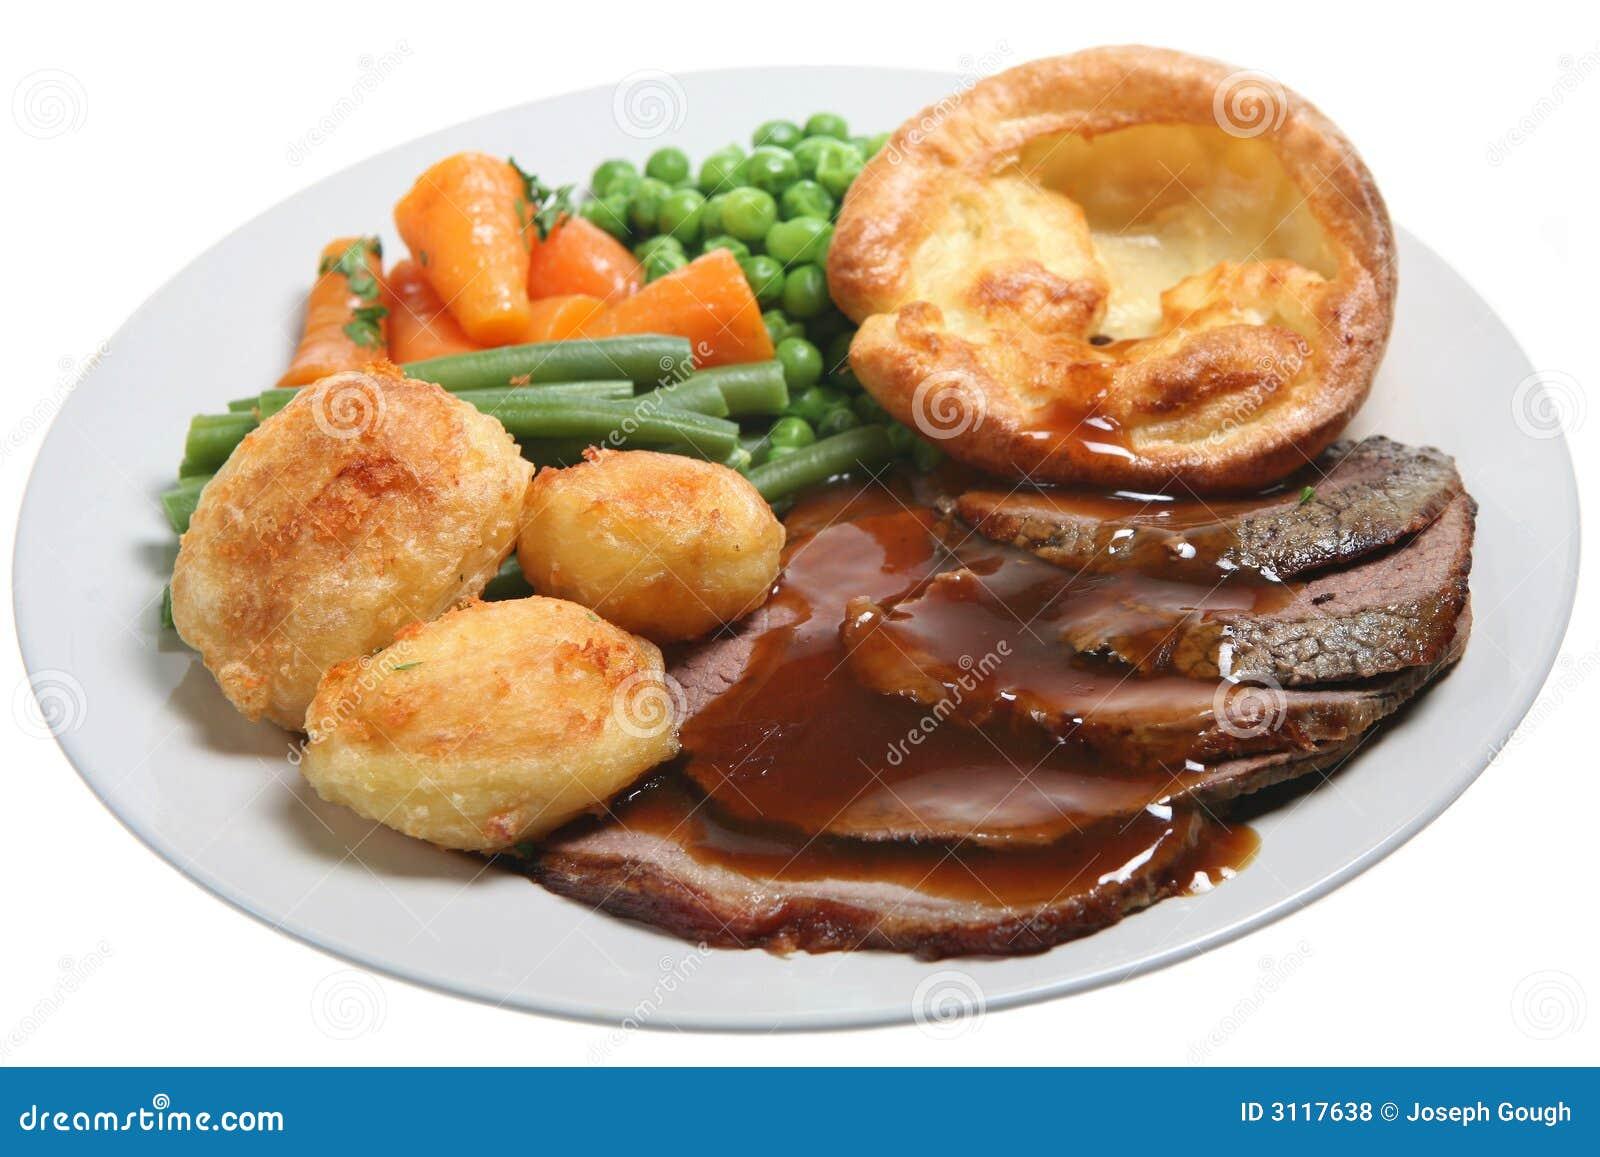 emeril sunday roast beef 2015 personal blog